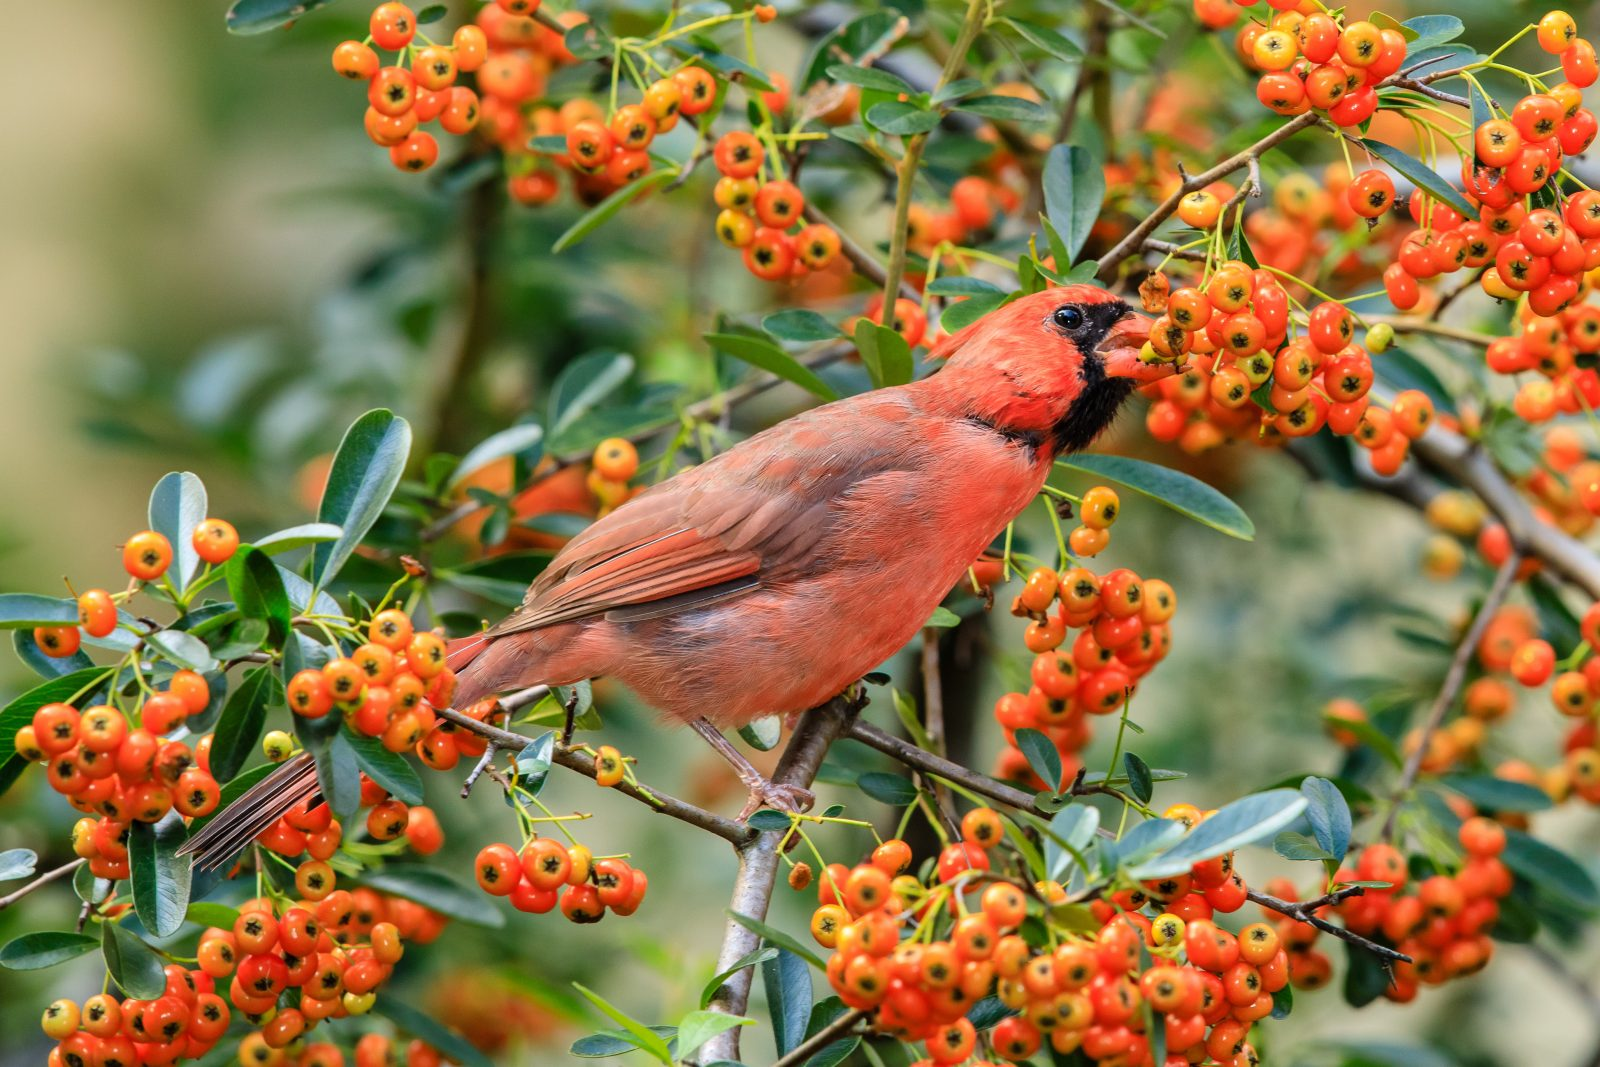 Cardinal in the Pyracantha Bush